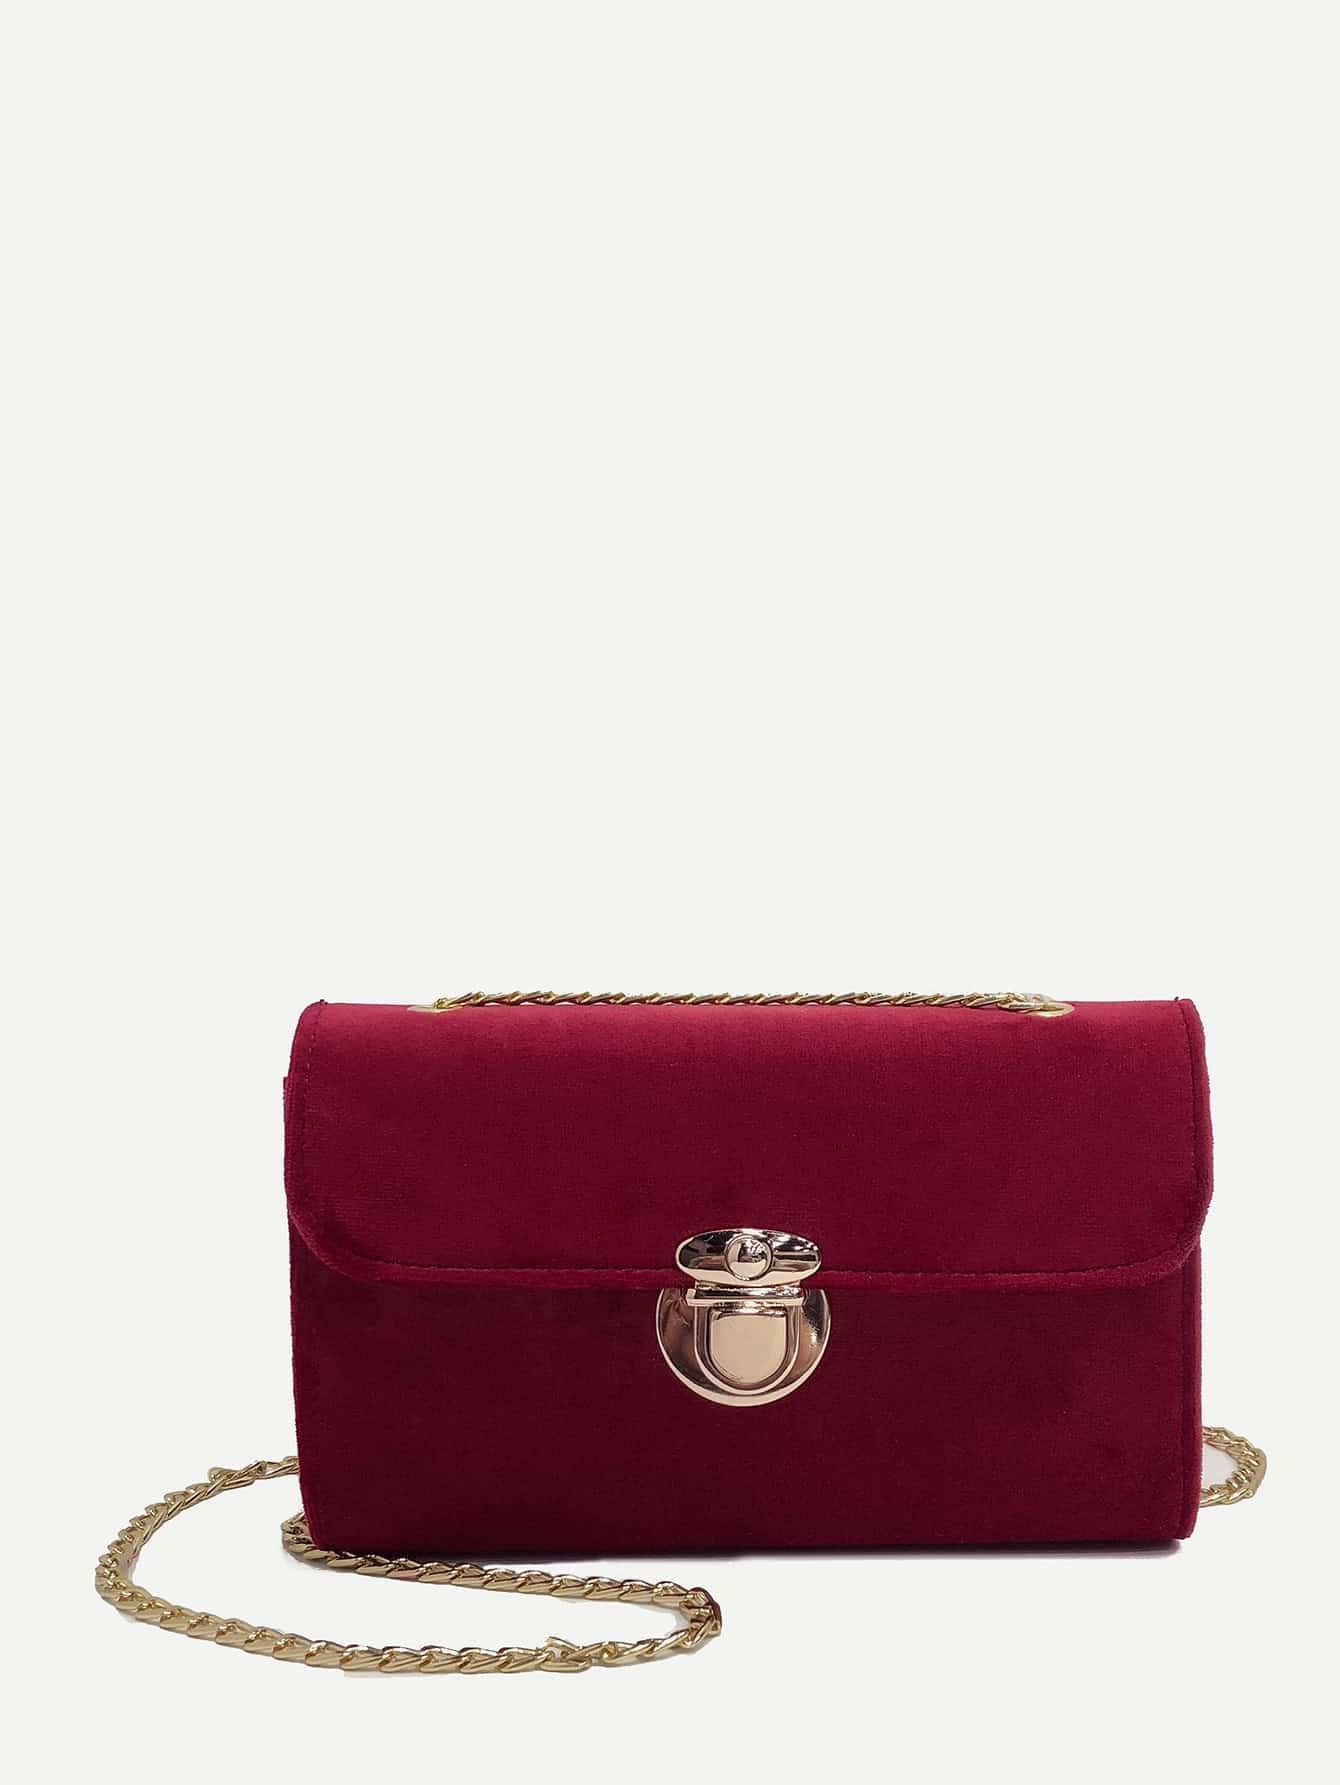 Push Lock Suede Chain Shoulder Bag цена 2017